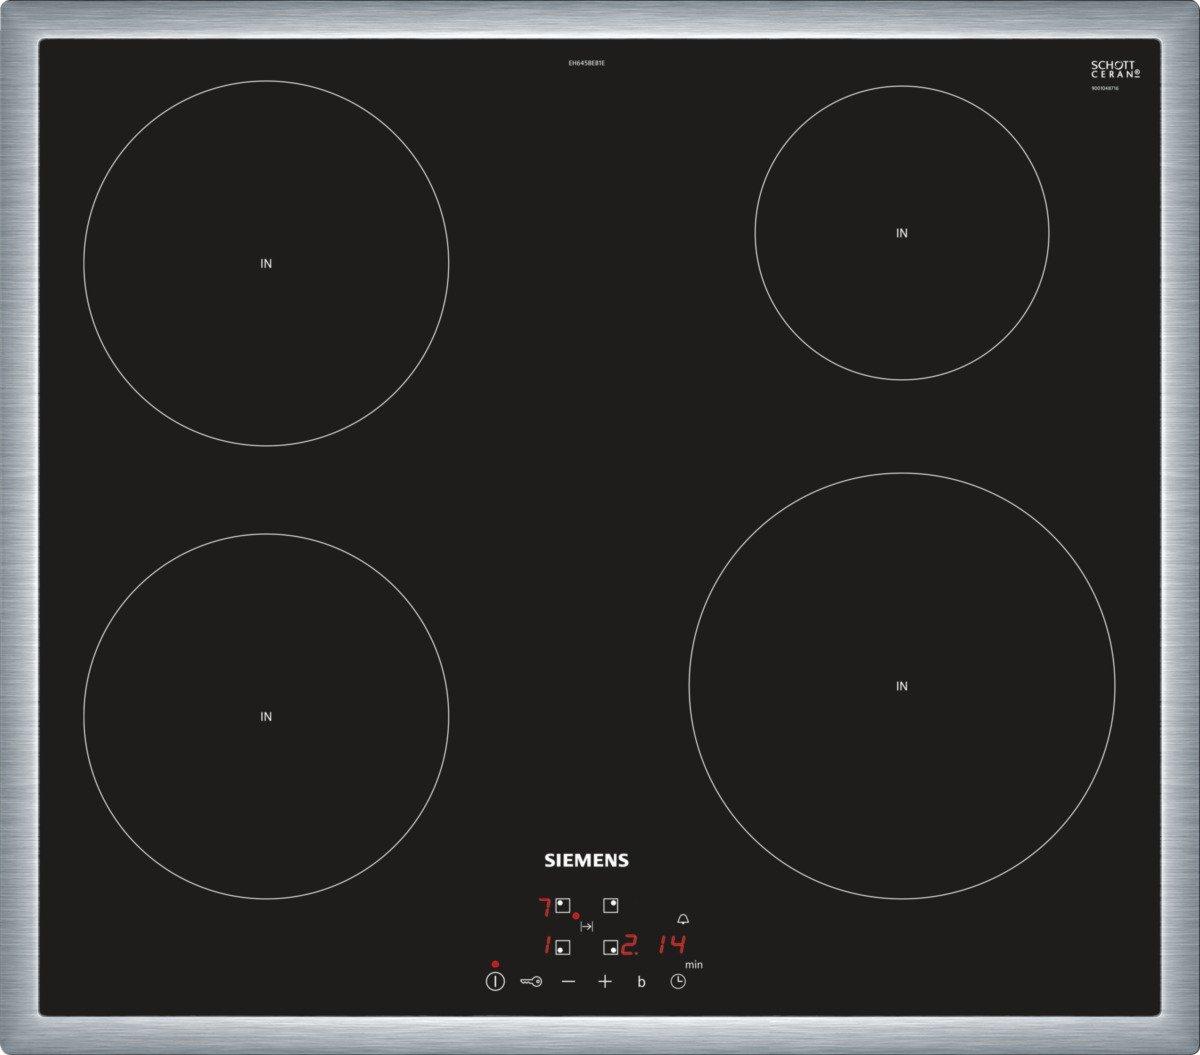 Siemens eh645beb1e iq100 hobs eléctrico/vitrocerámica/vidrio y ...